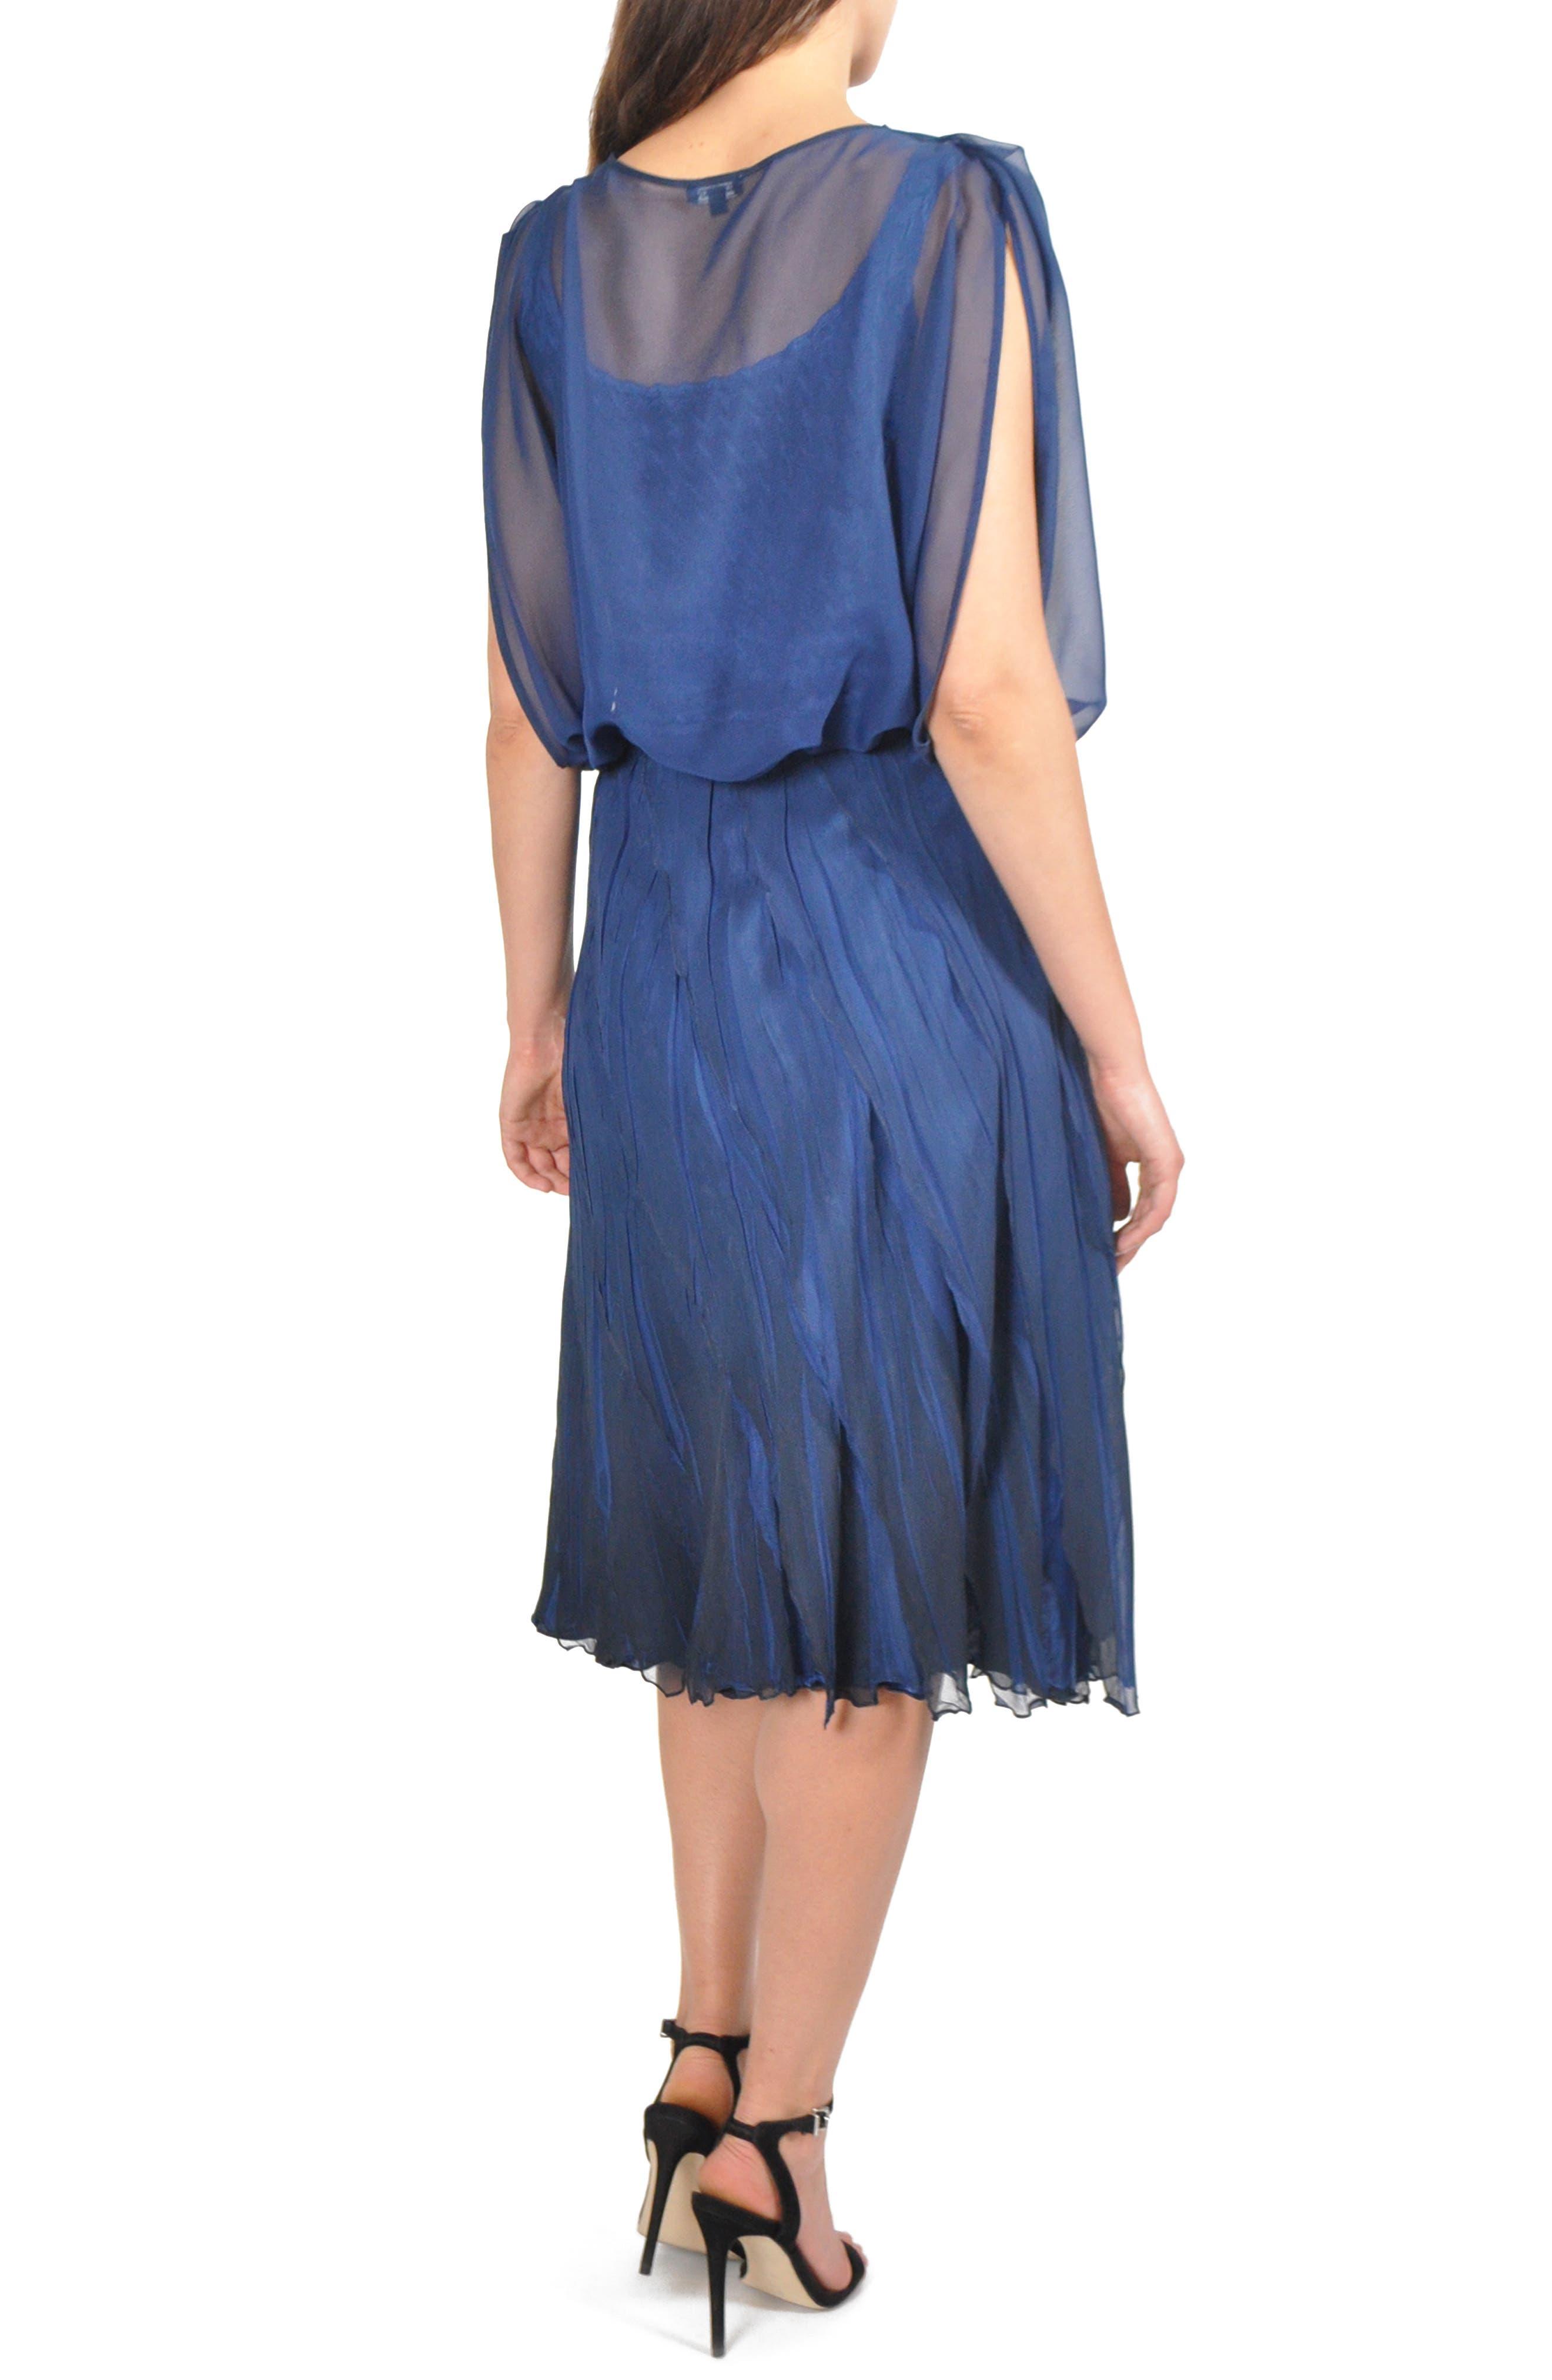 Blouson Tiered Dress,                             Alternate thumbnail 2, color,                             NAVY BLACK OMBRE